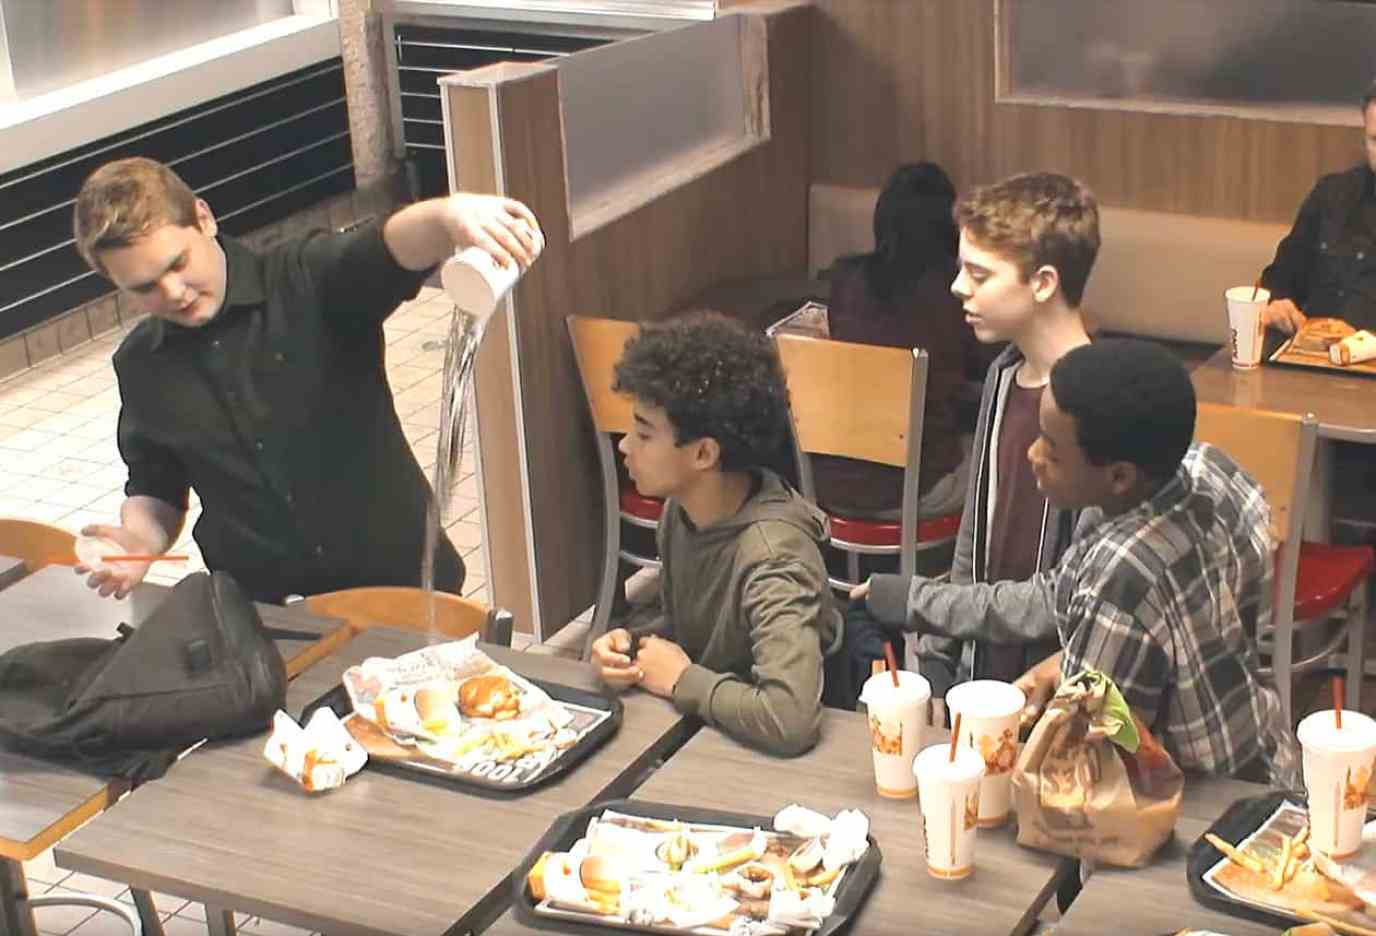 burger king bullying